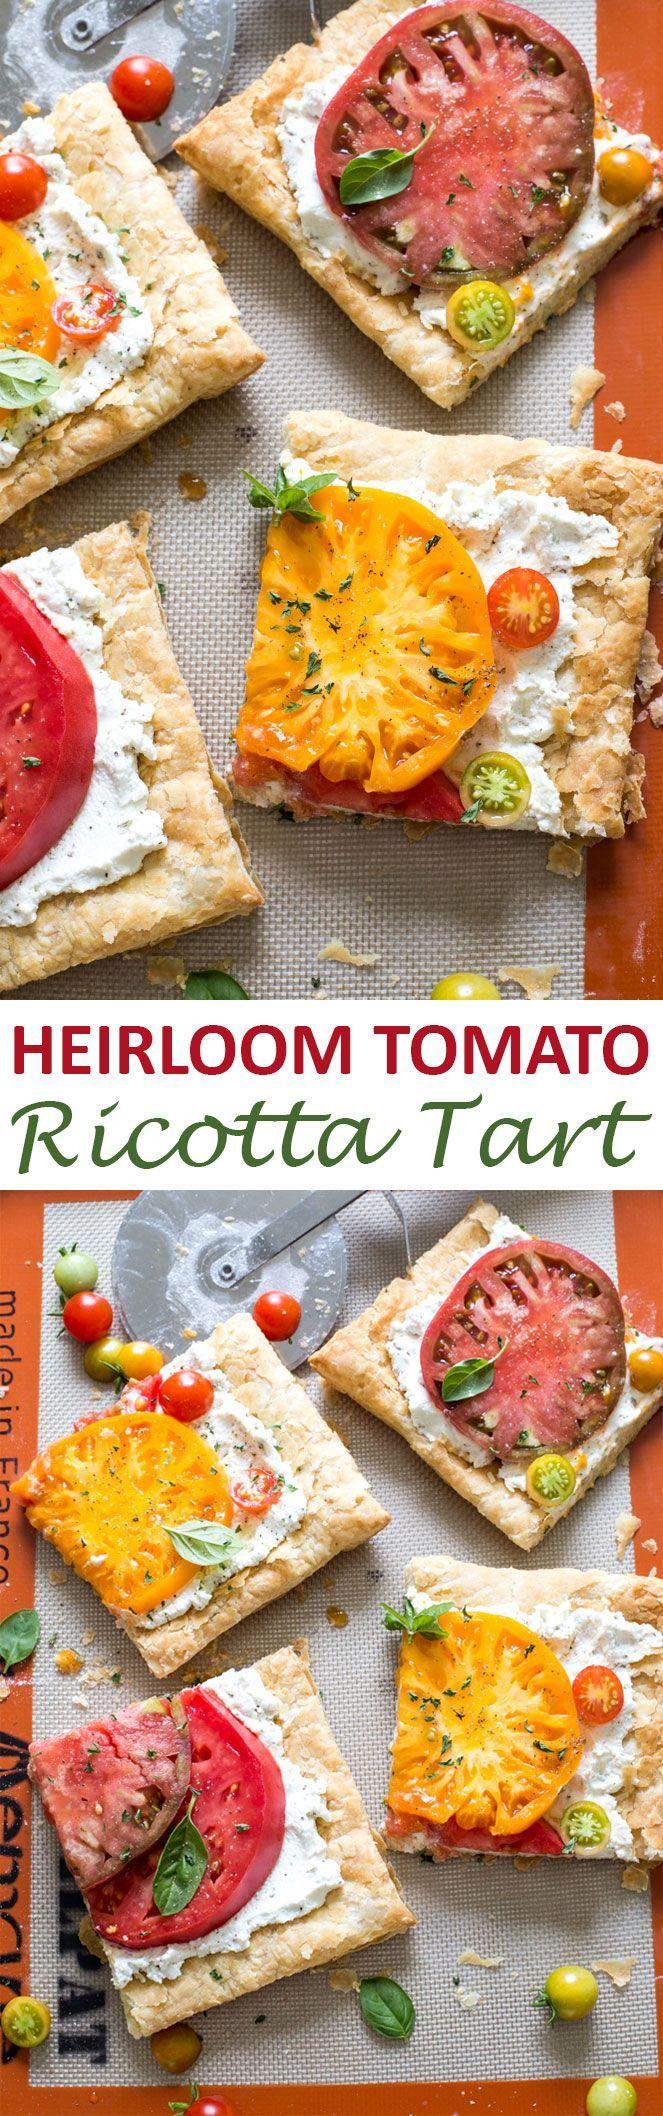 Super Colorful Heirloom Tomato Ricotta Tart. Ripe tomatoes layered ...